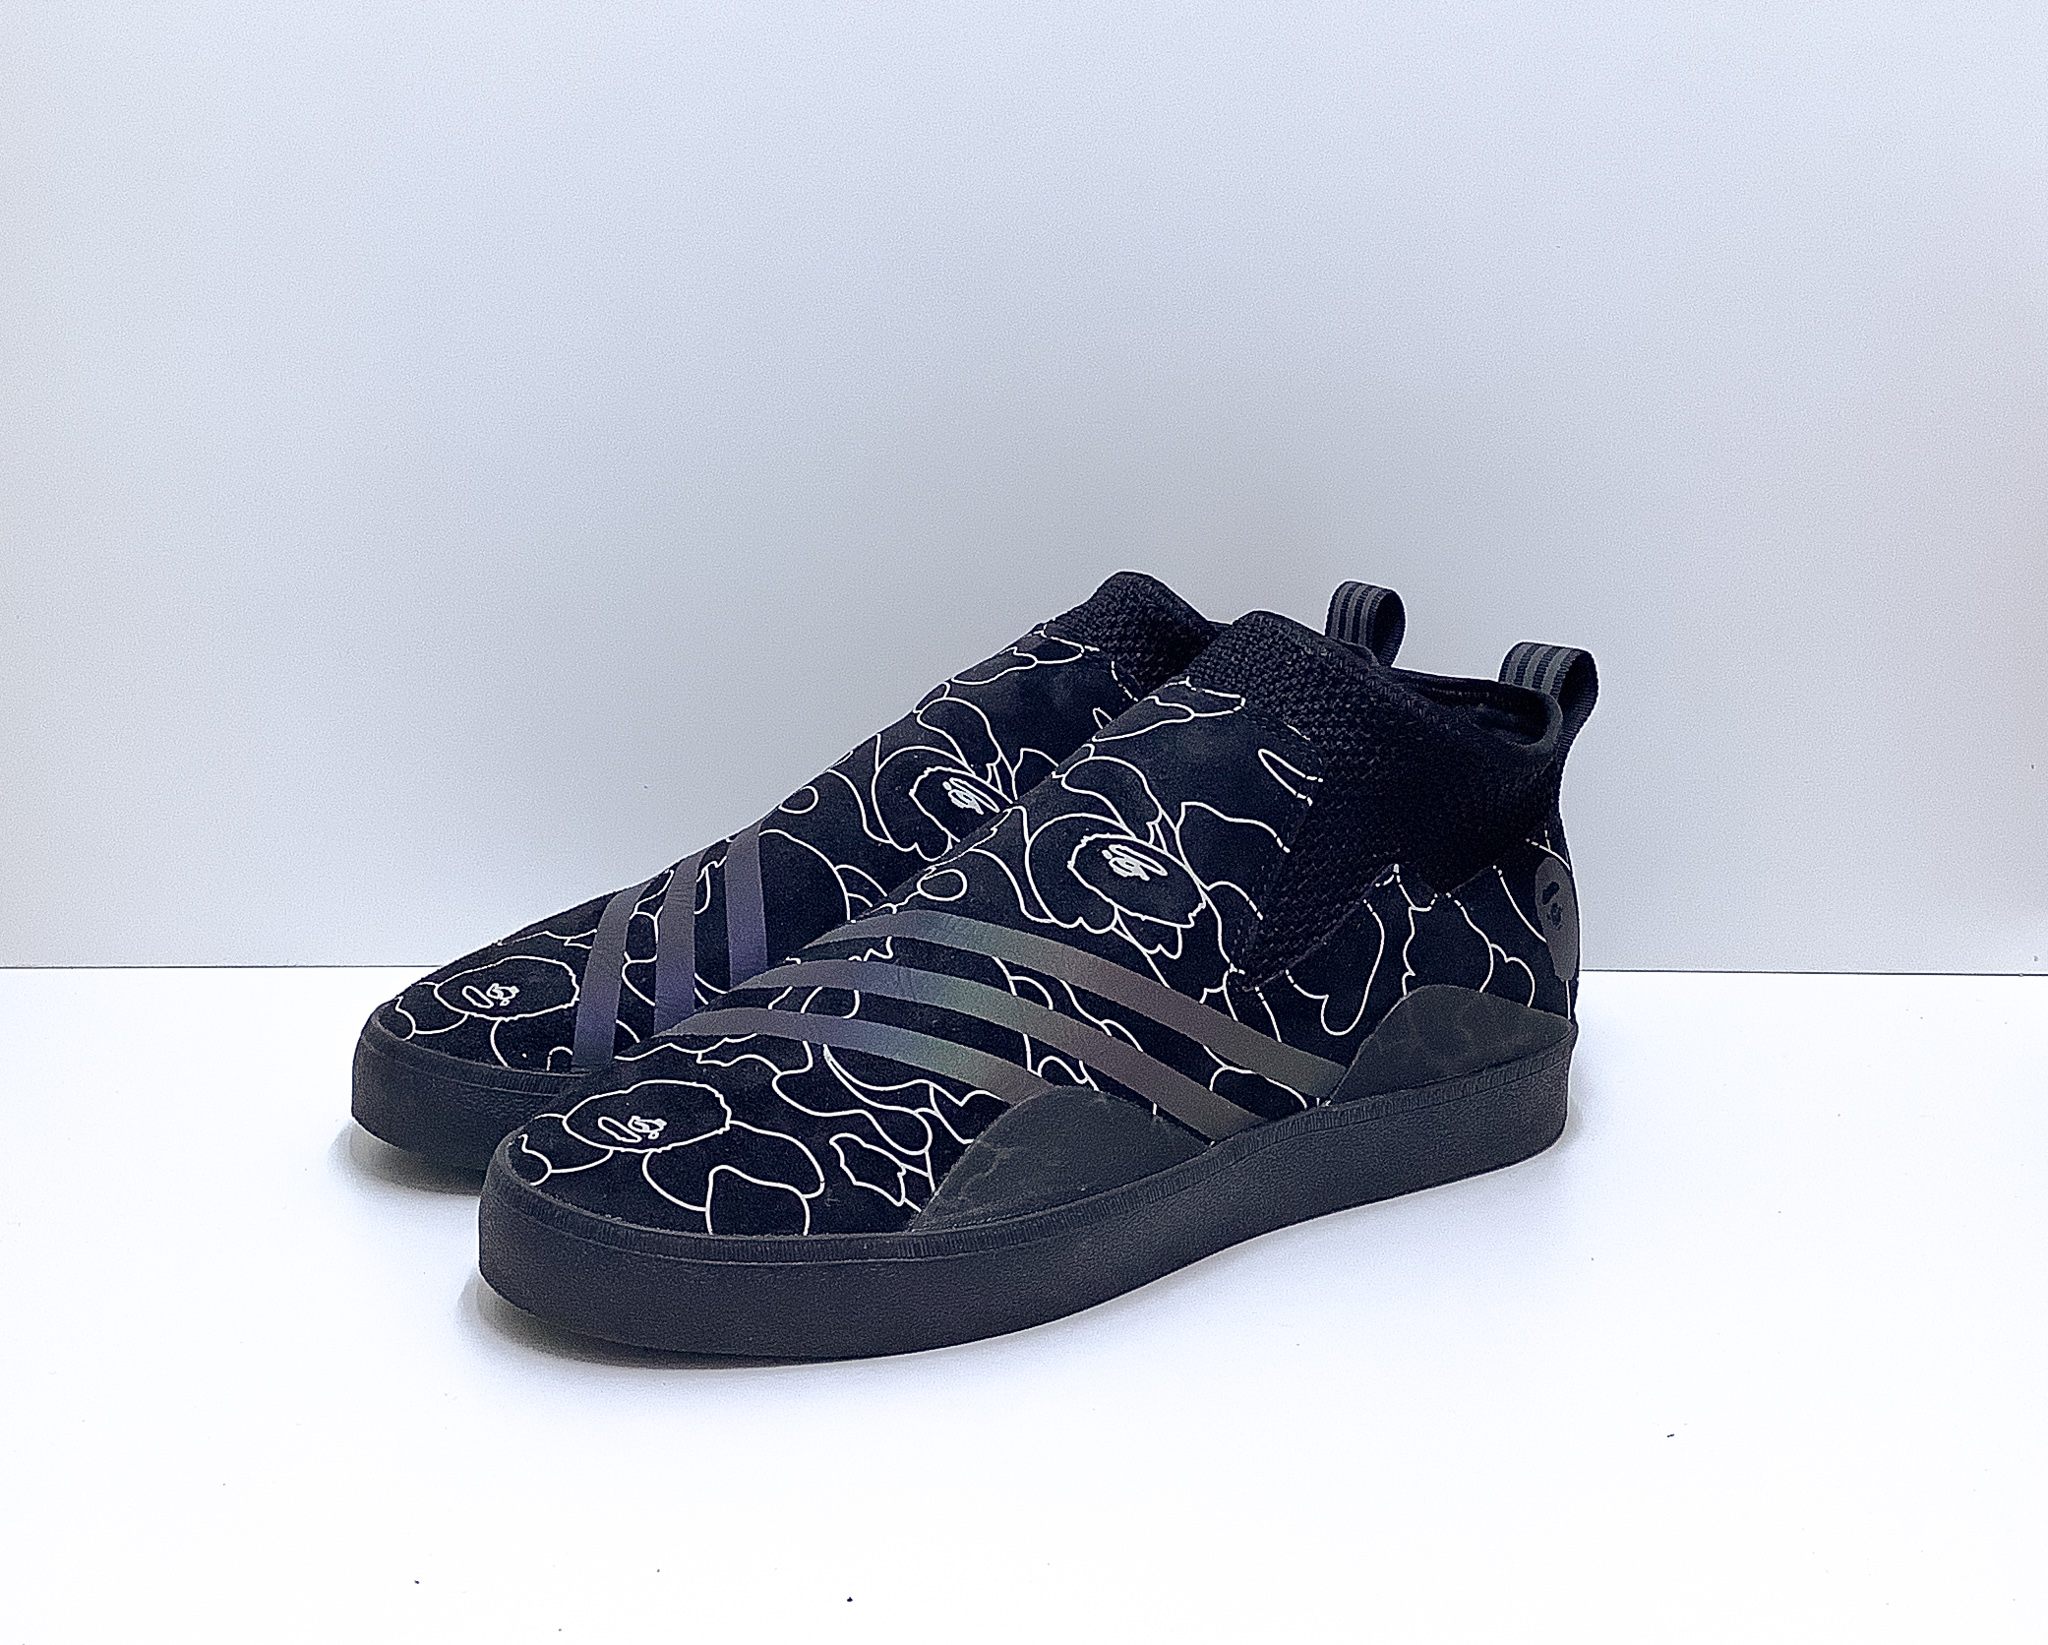 Adidas 3ST.002 Bape